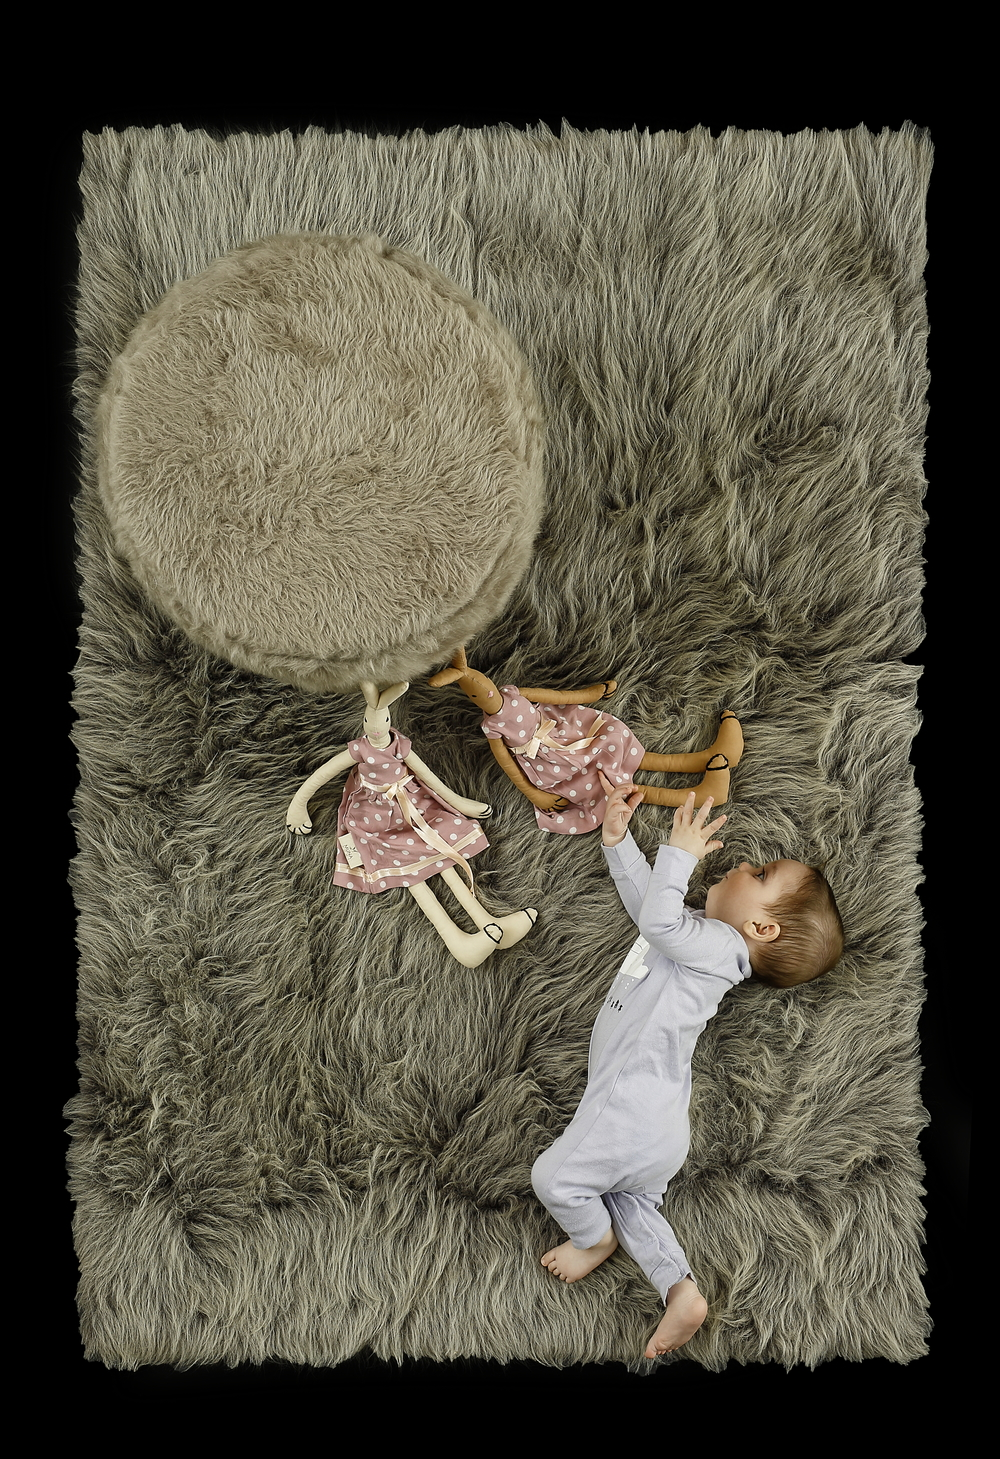 - Long Pile Melange Grey Rug     - Pouf Stone Grey Ø 45 cm /17.7 Inch, H. 40 cm / 15,7 Inch.     - Handmade Bunny Doll, High 50 cm - 20 Inch Approx.